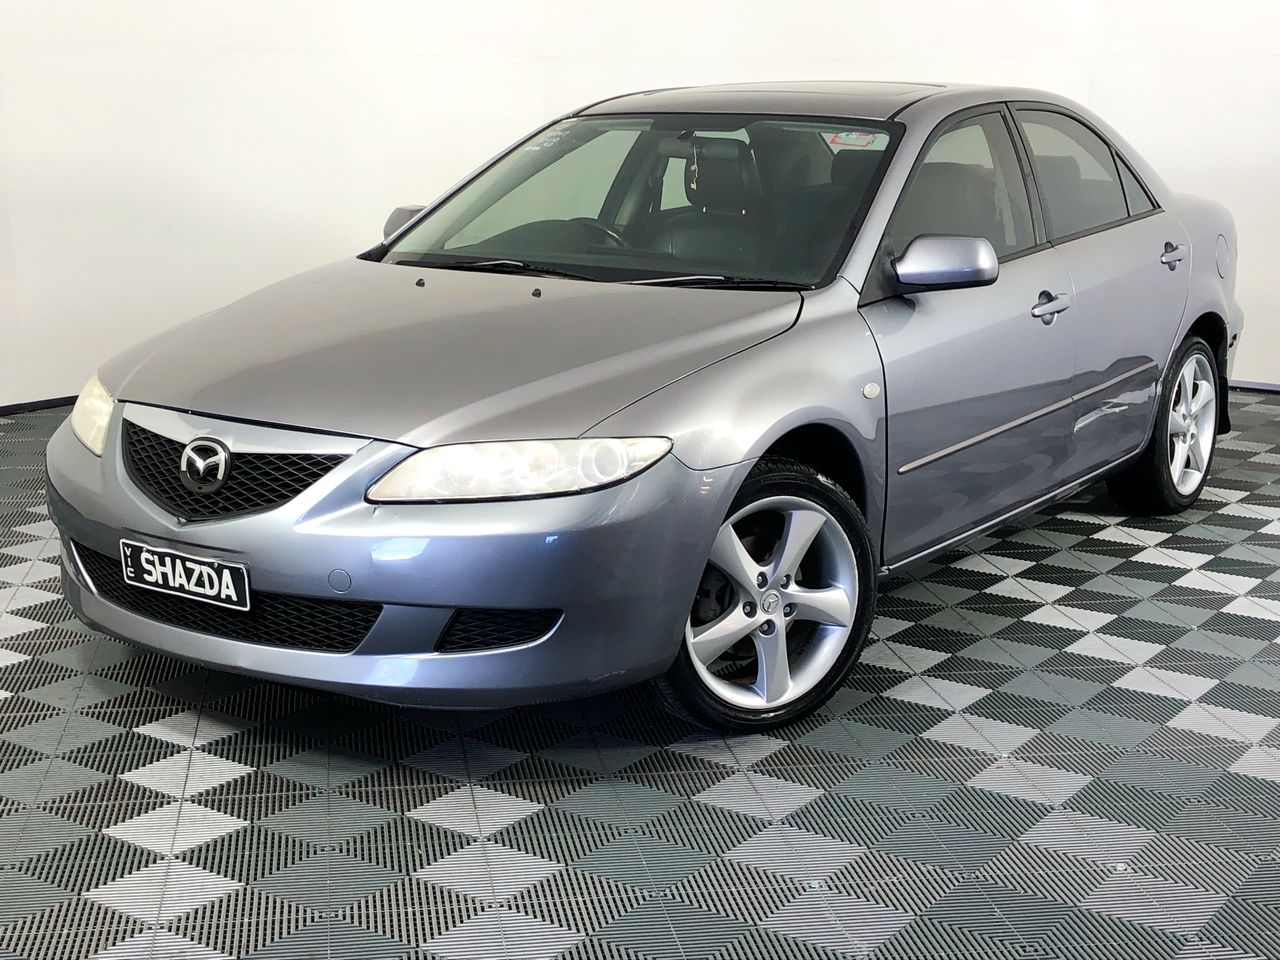 2004 Mazda 6 Luxury GG Automatic Sedan